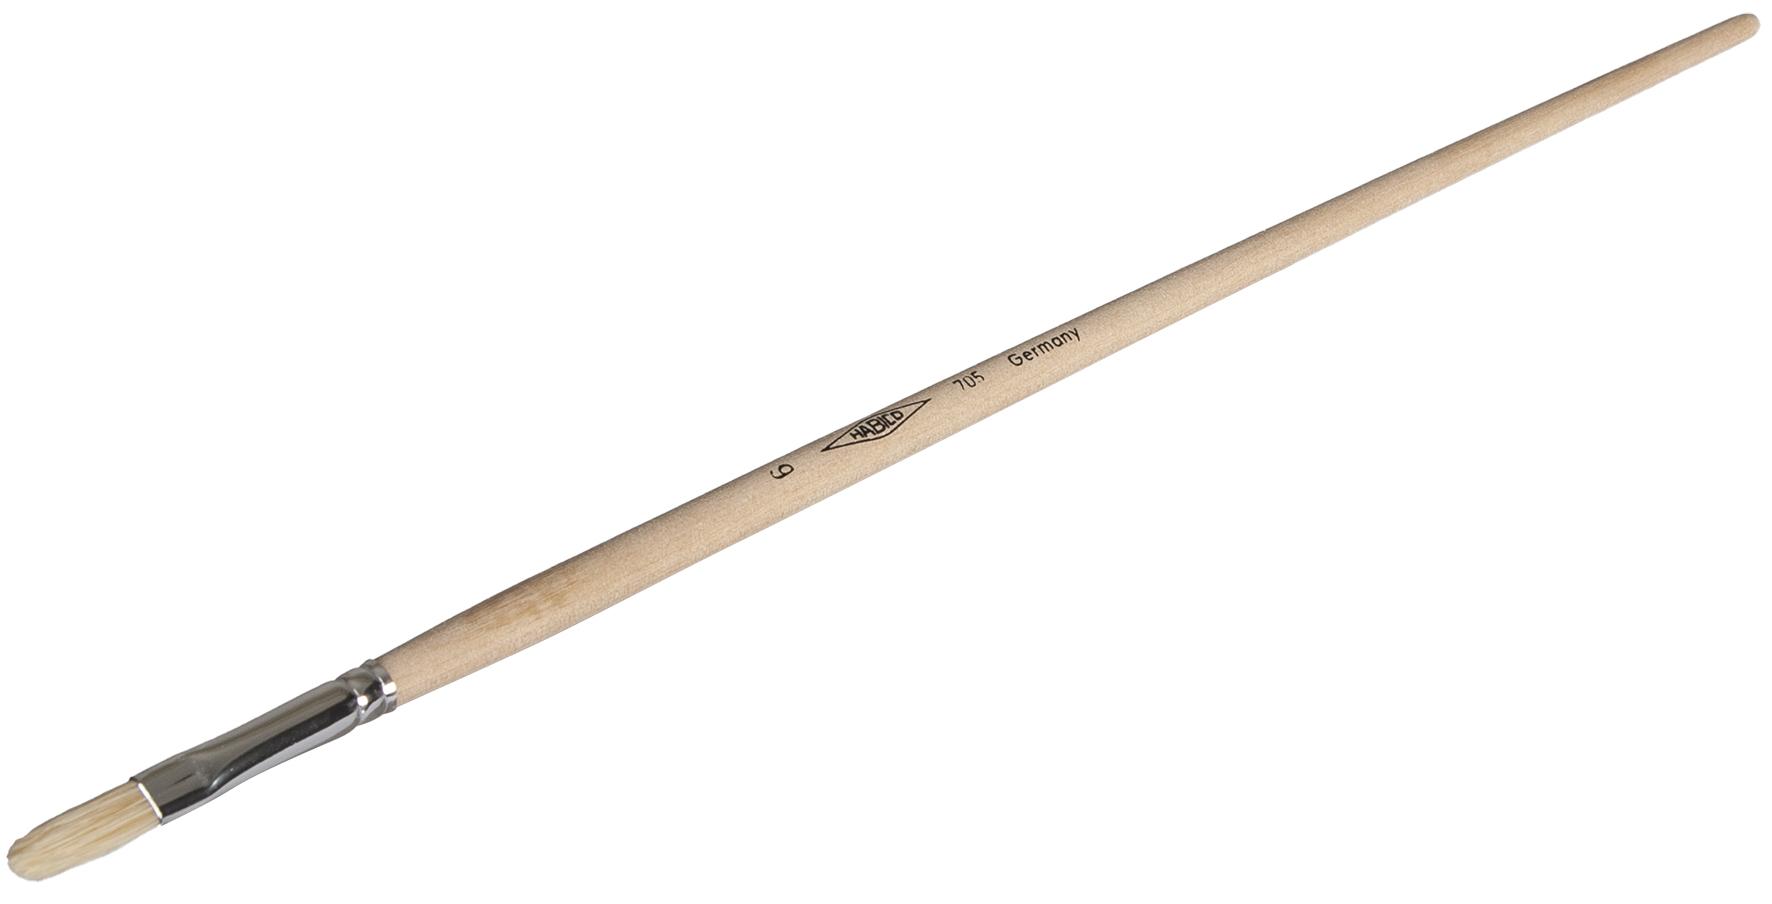 Anlegepinsel flach | Gr. 6